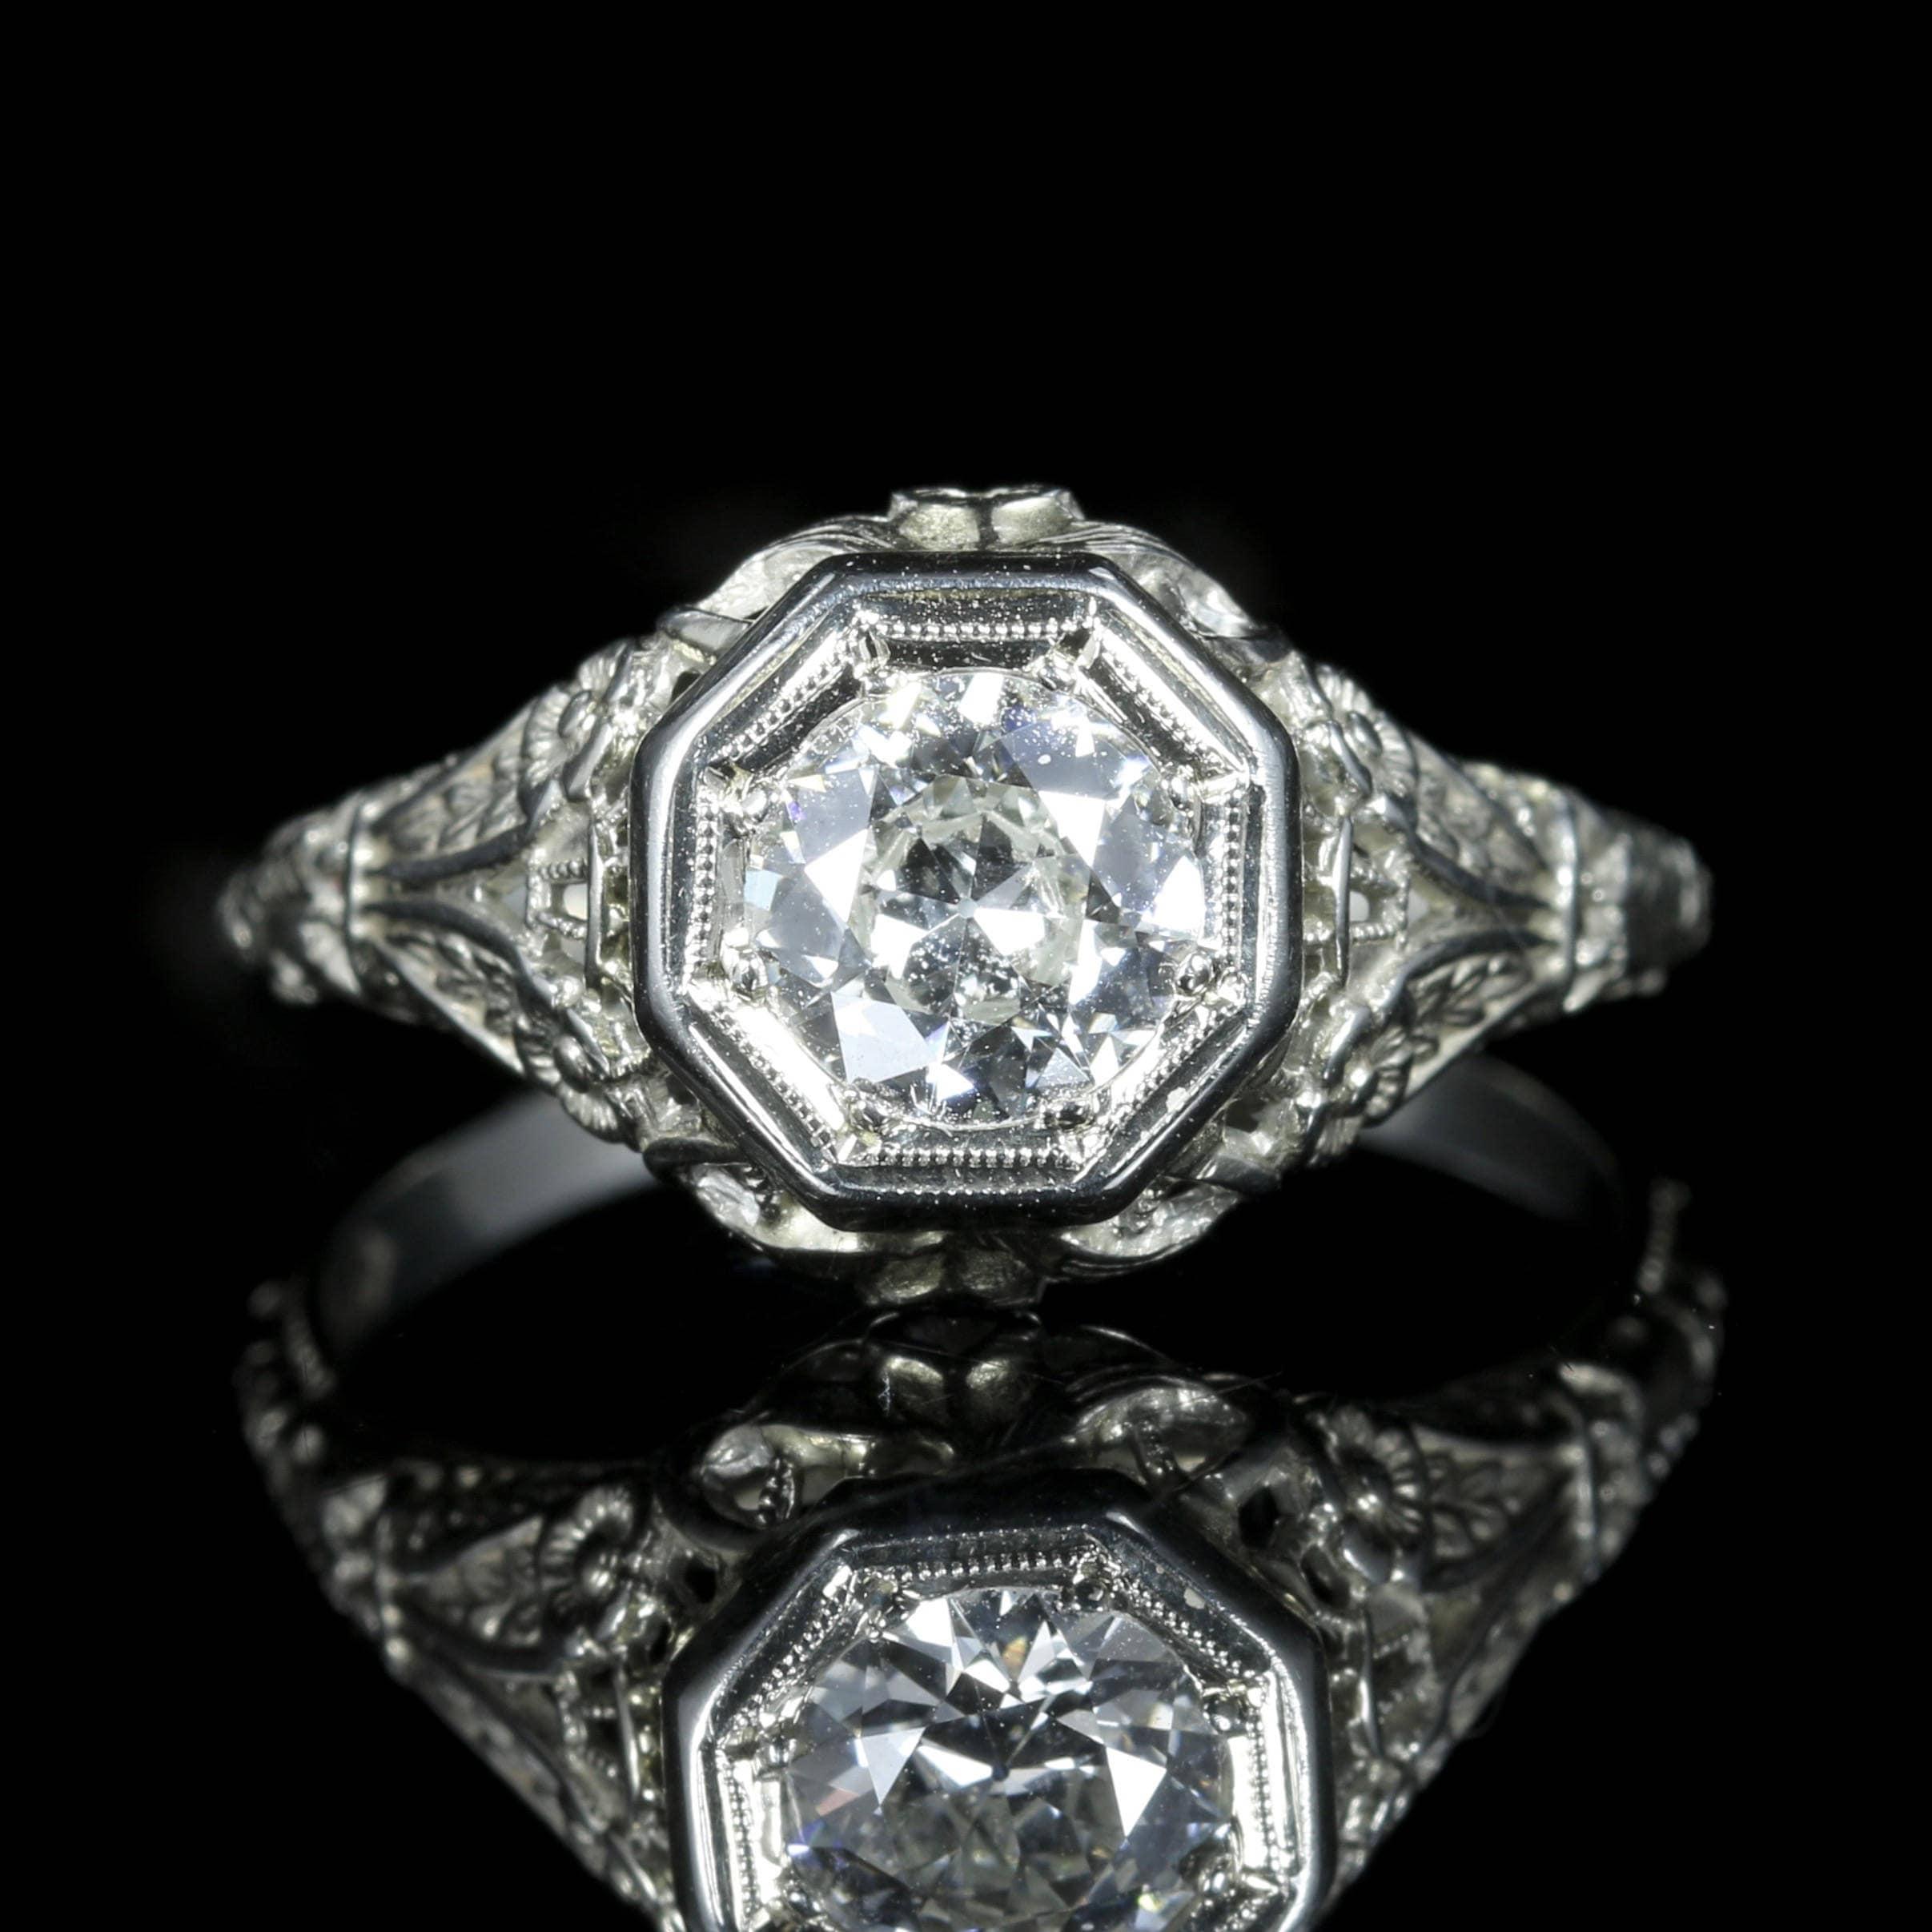 Antique Art Deco Diamond Engagement Ring 18ct White Gold 1.10ct Diamond